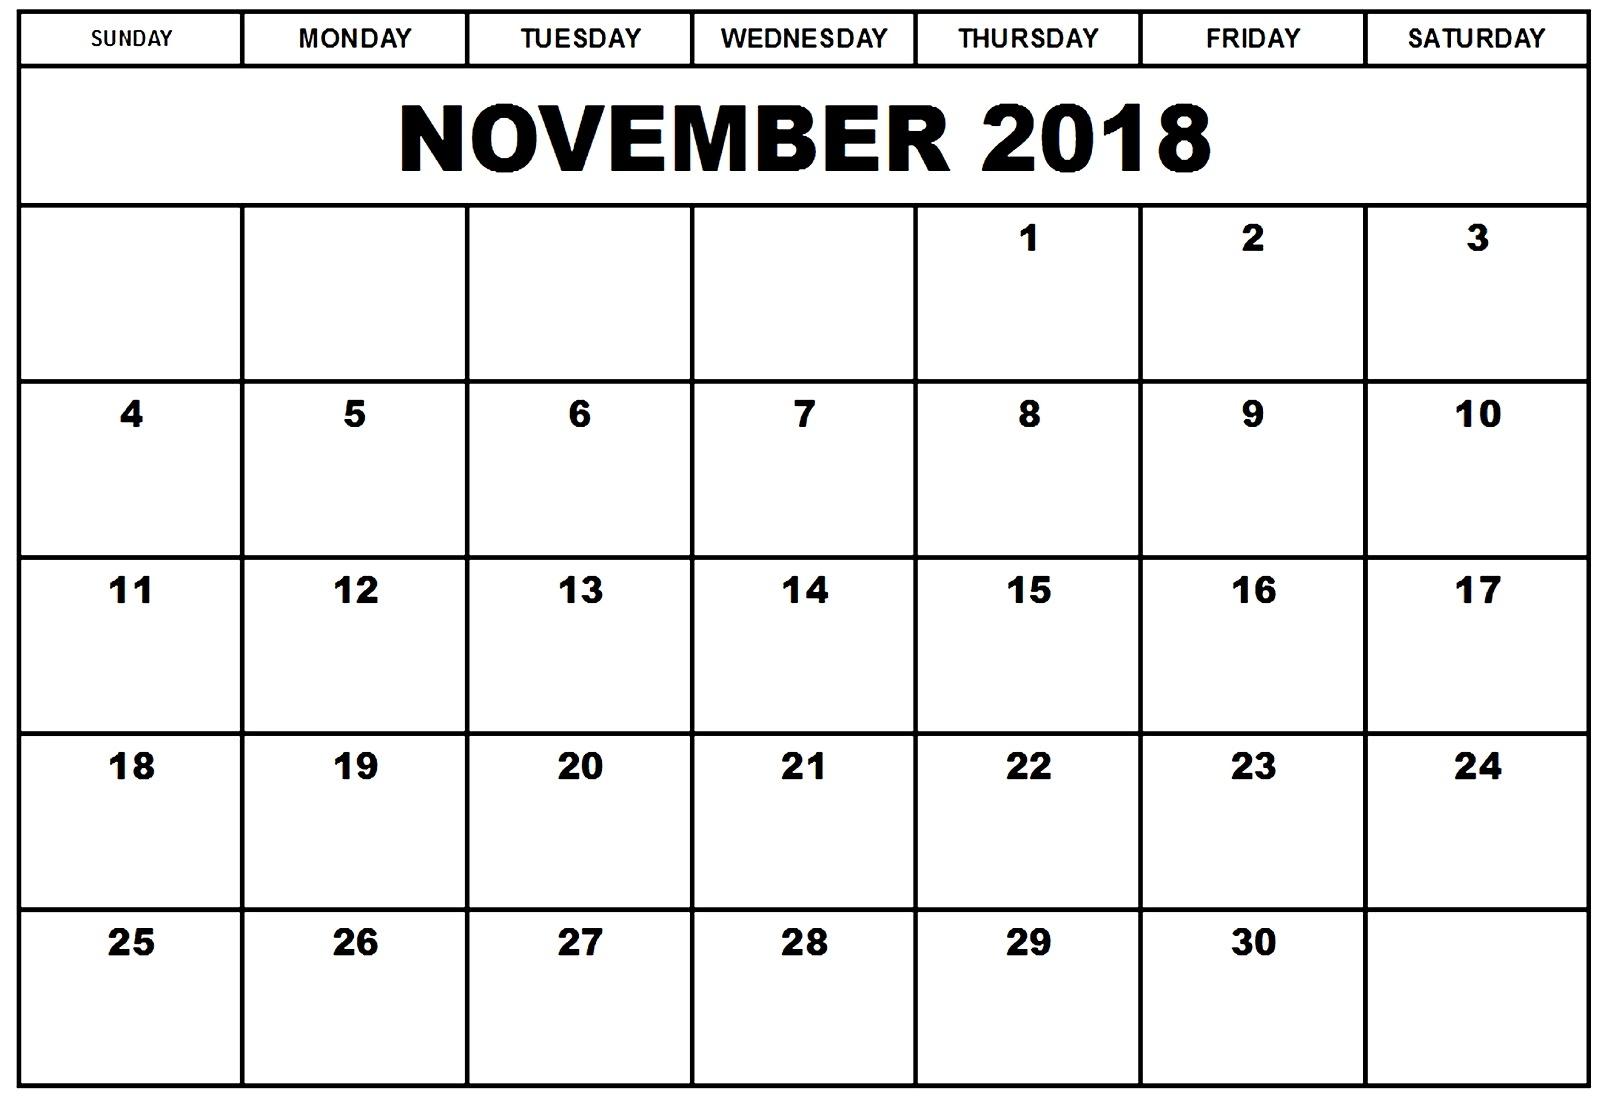 november 2018 calendar pdf excel word november 2019 calendar November 2018 Excel Calendar erdferdf